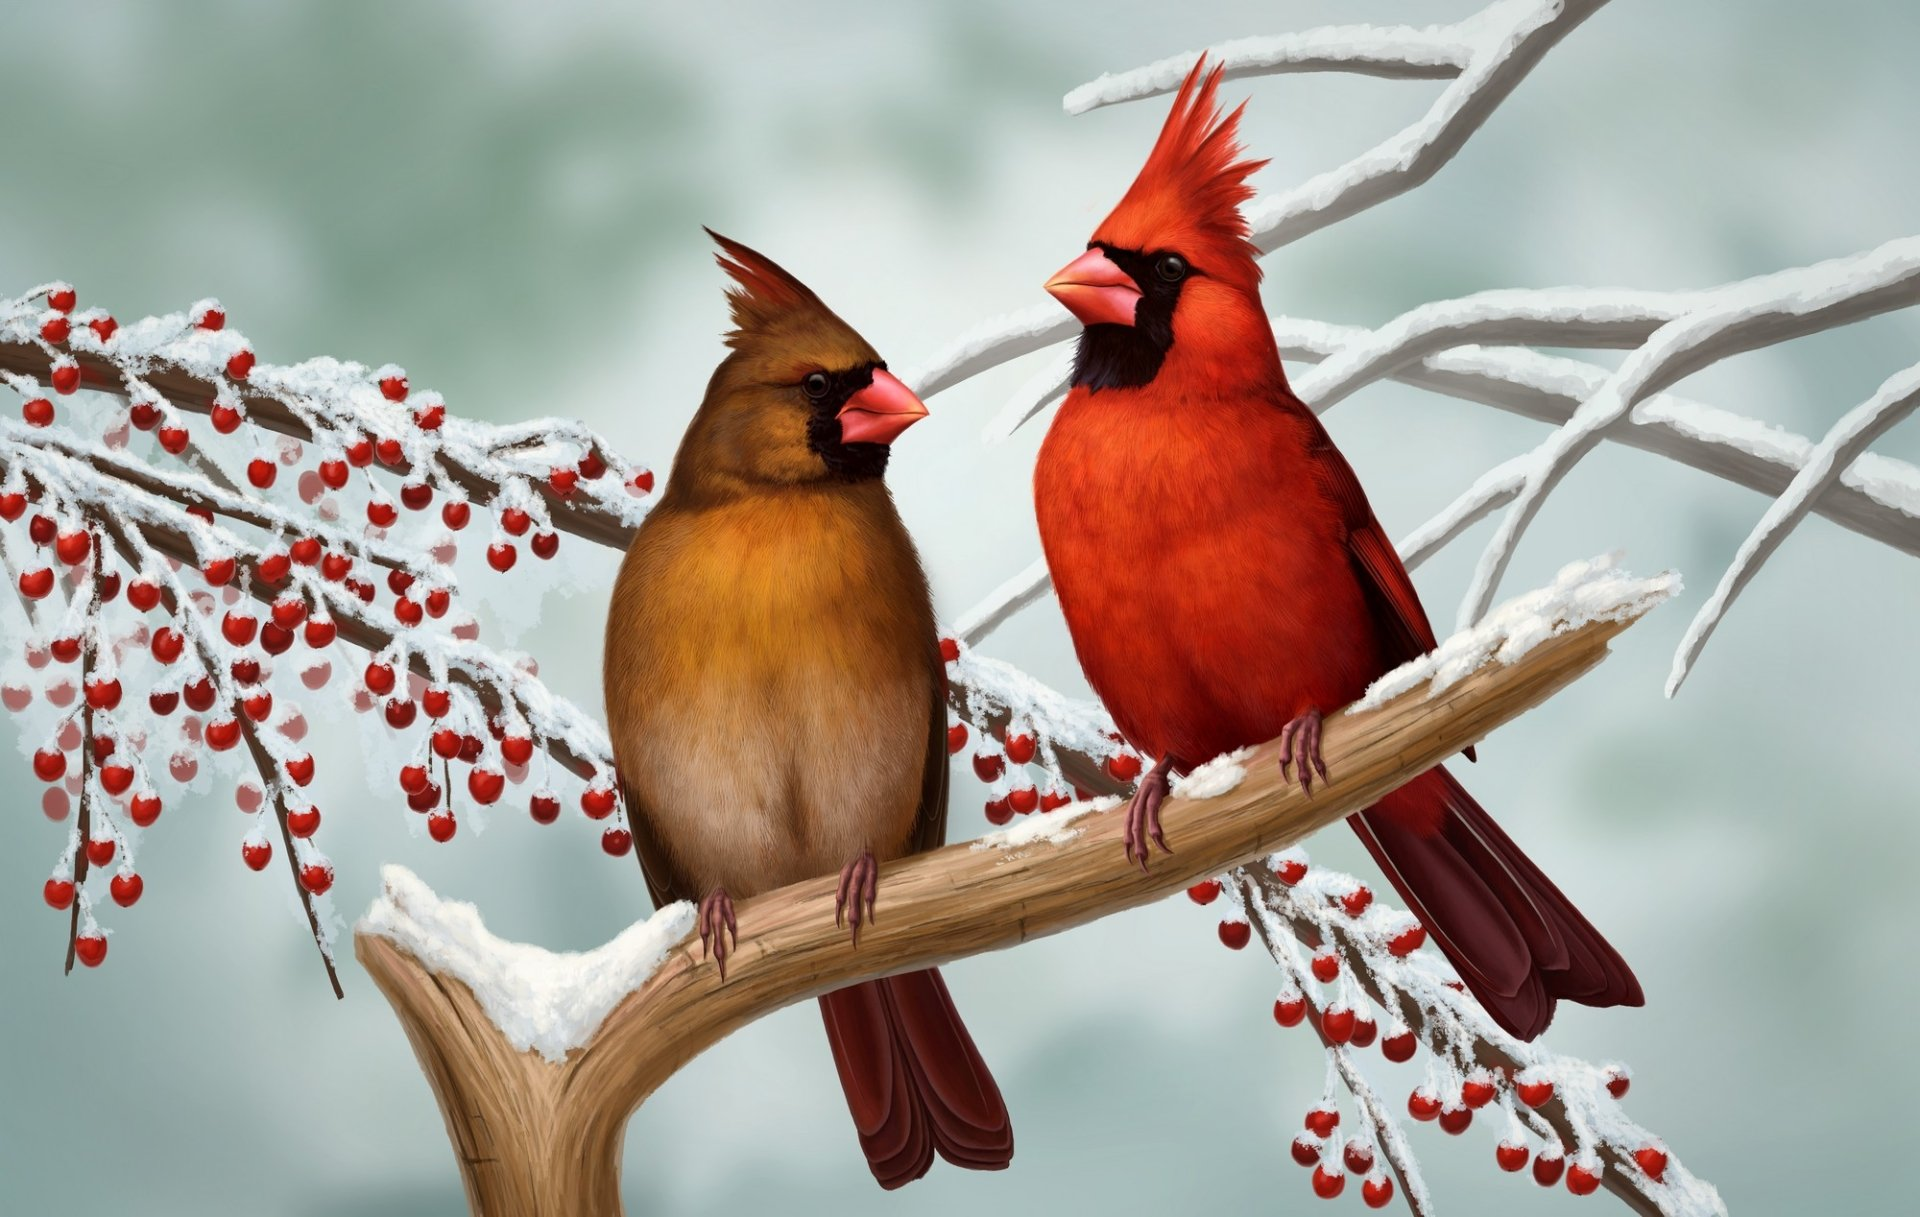 Cardinal hd wallpaper background image 2000x1268 id - Winter cardinal wallpaper ...